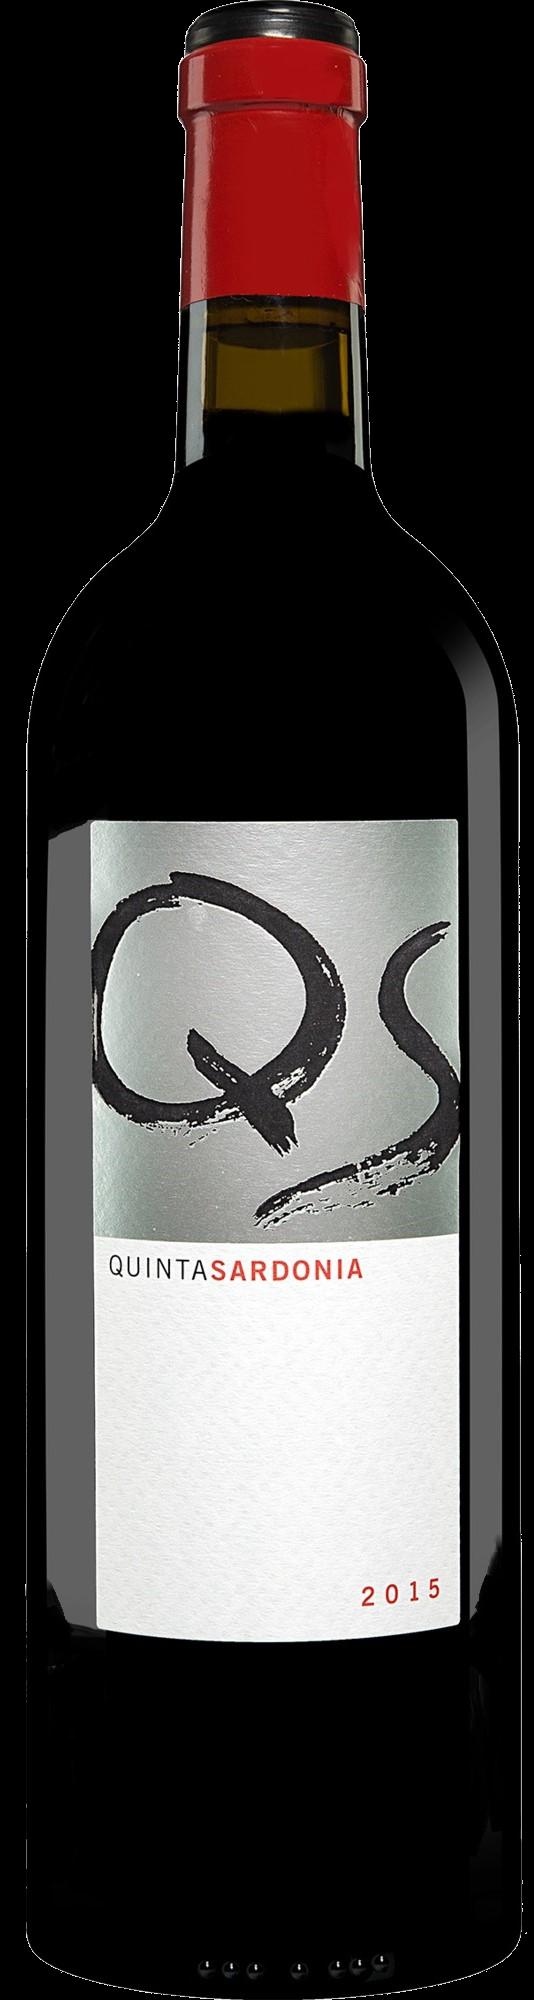 "Quinta Sardonia ""QS"" 2015"